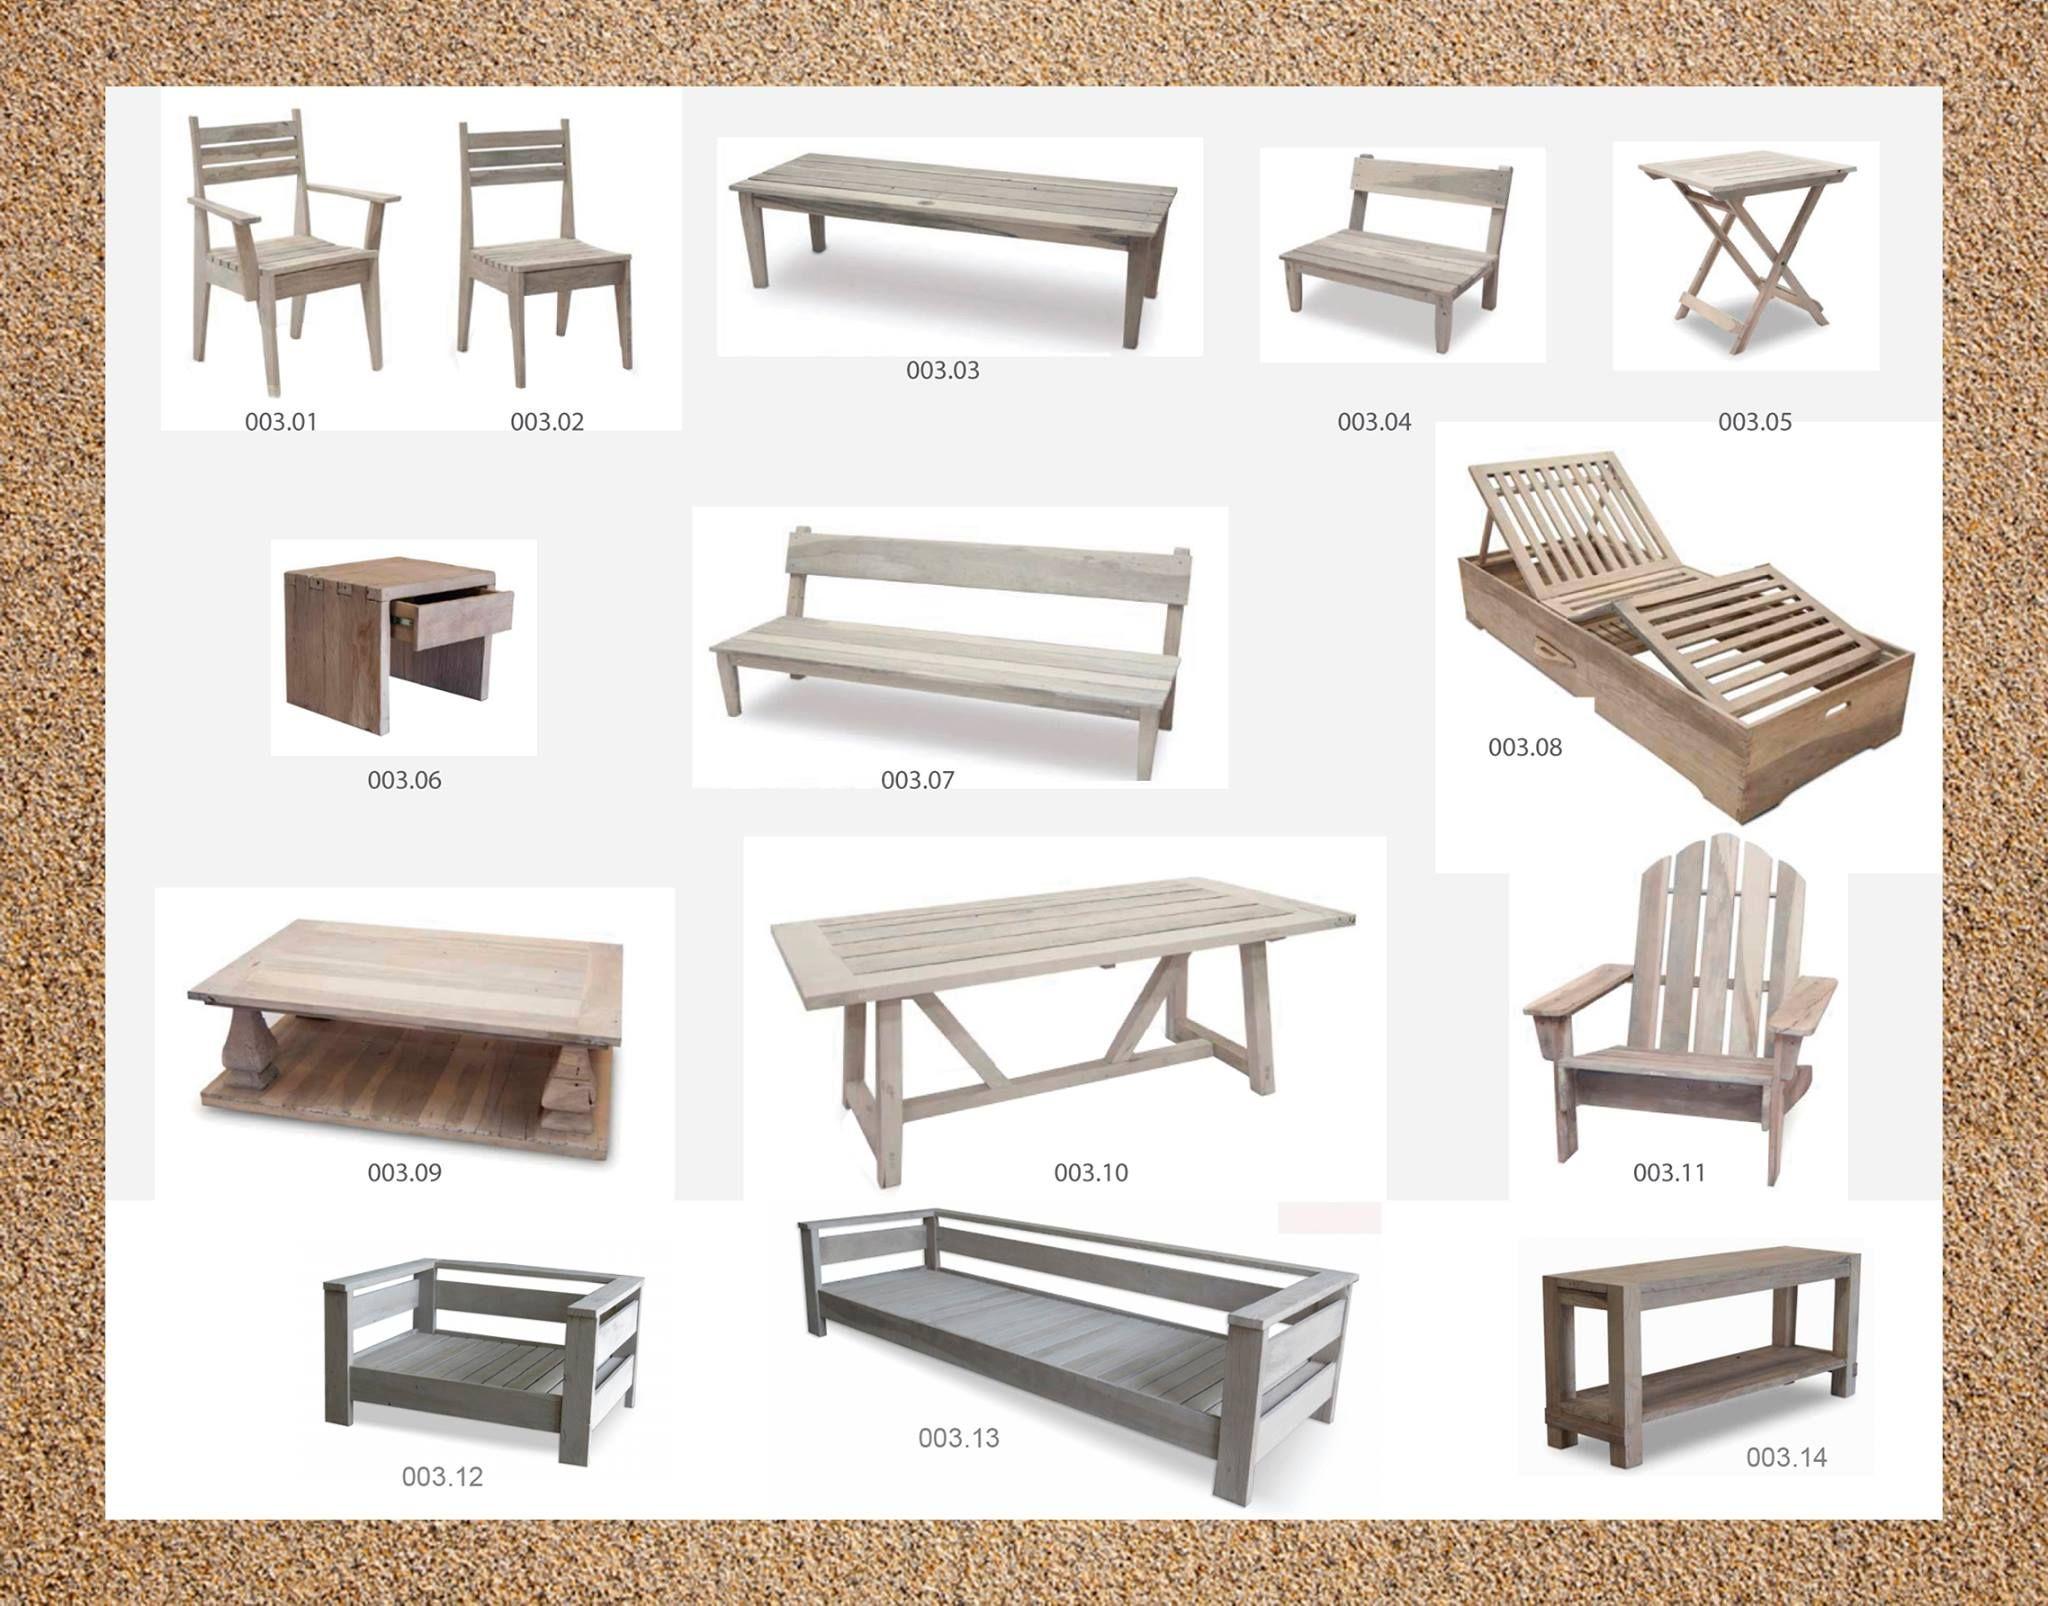 Muebles O'Que Significa - Muebles De Exterior Esta Linea De Muebles Evoca A Las Maderas [mjhdah]https://s3.laprensa.com.ni-bq.s3-us-west-2.amazonaws.com/wp-content/uploads/2017/05/02165504/D-1024×822.jpg